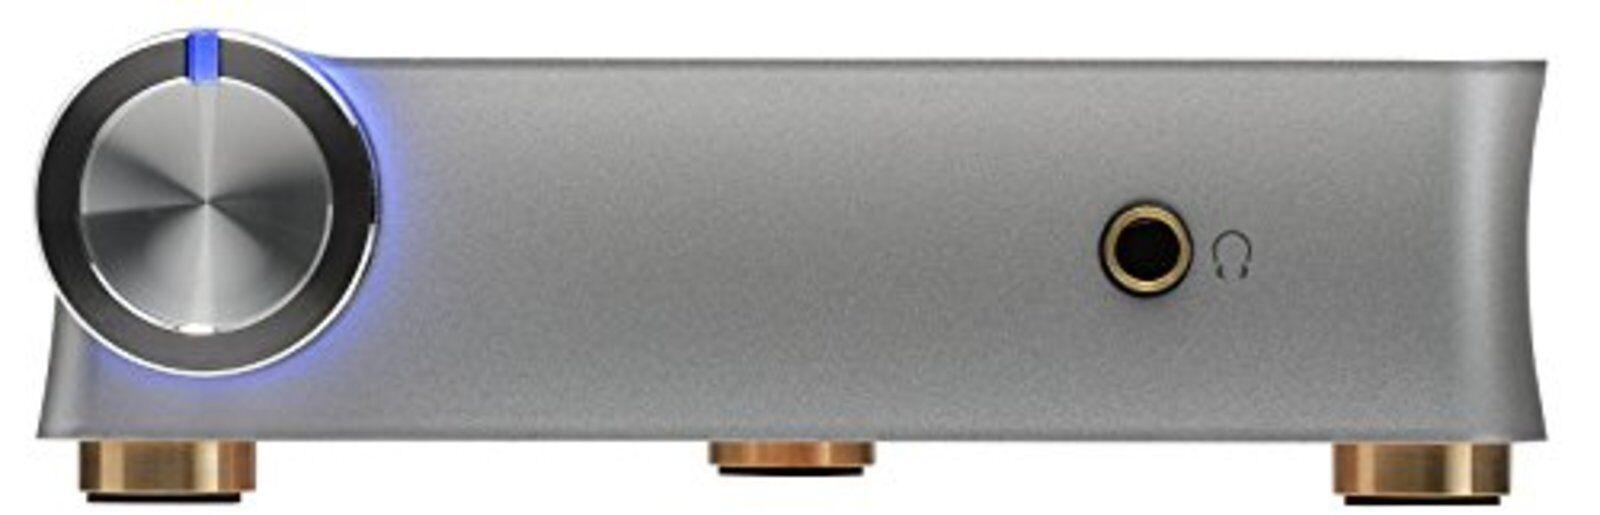 KORG USB DAC Digital analog congreener Phono input compatible 1bit DS-DAC-10R F S